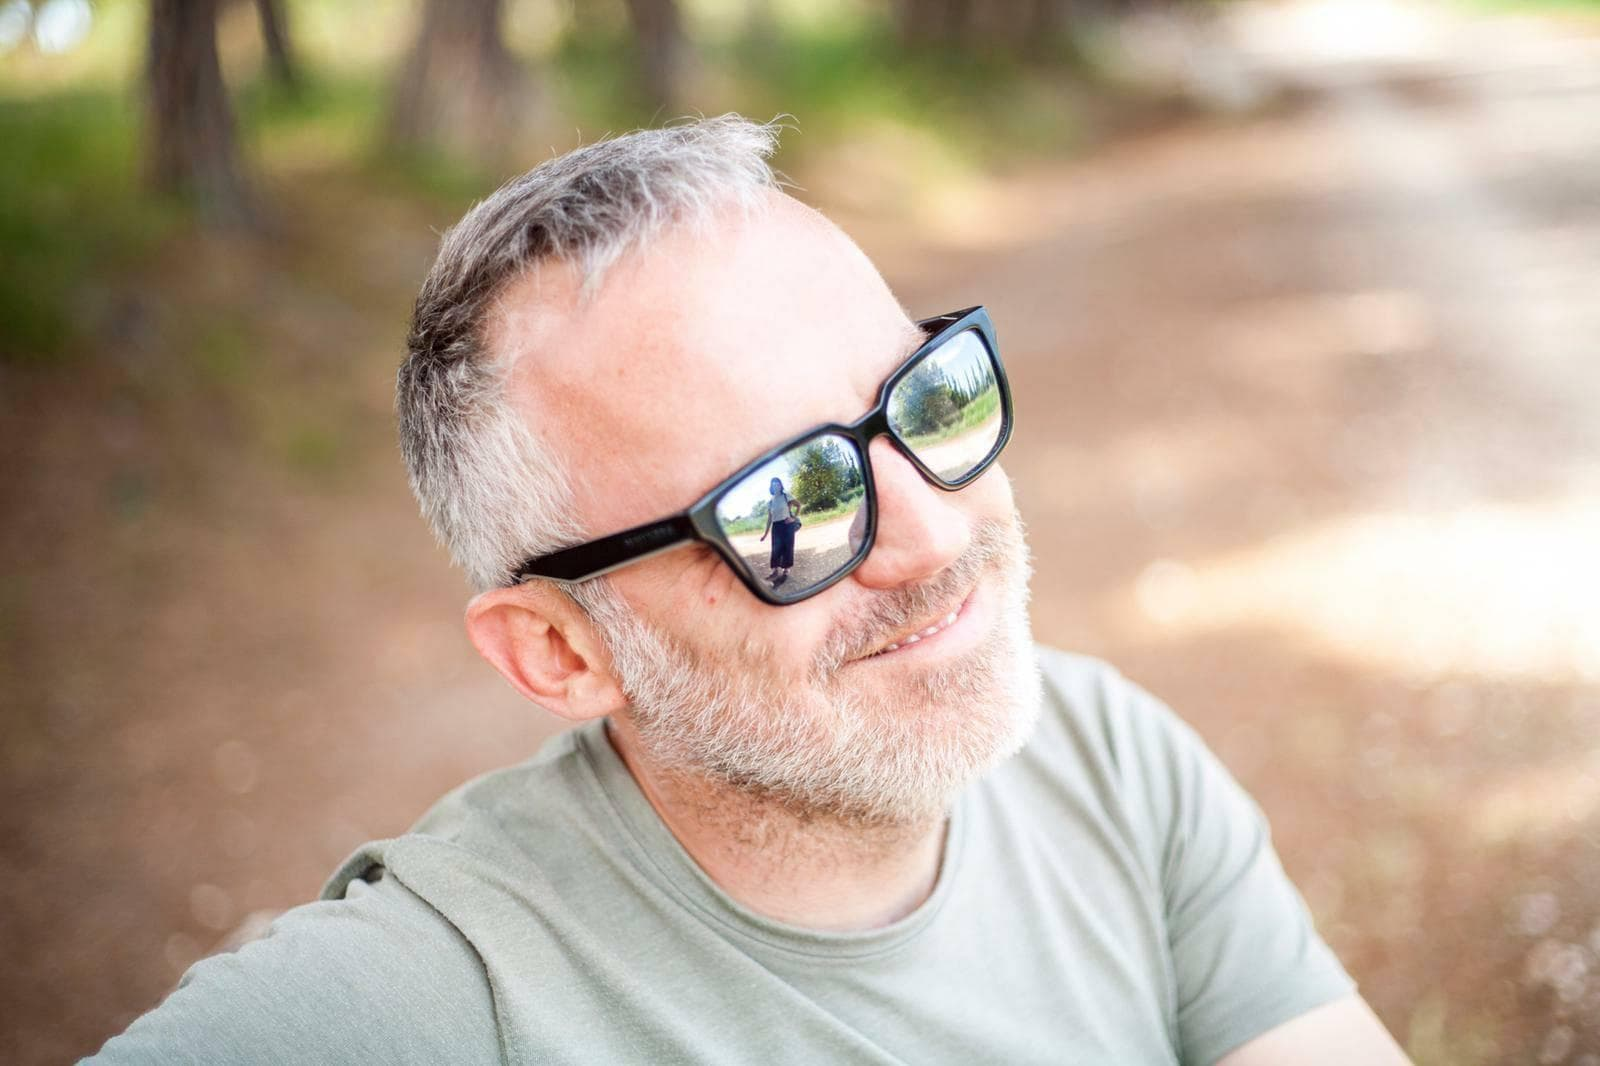 Jorge Inmofotos